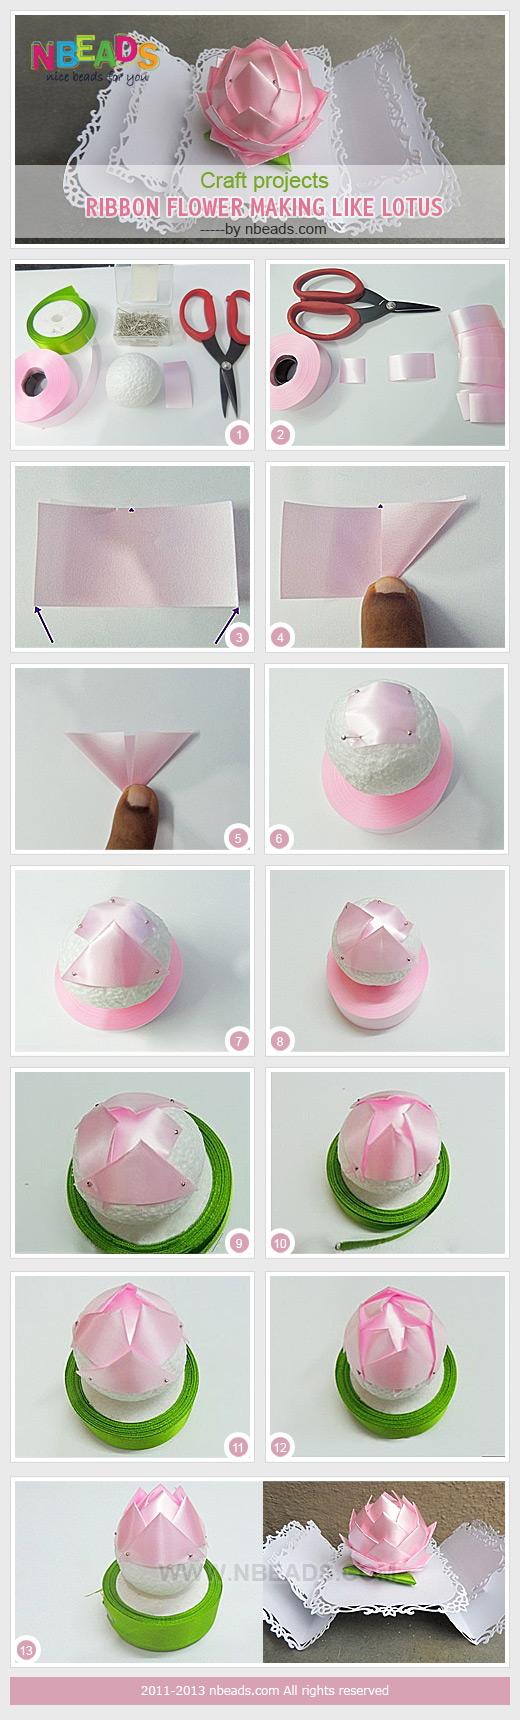 Craft Projects Ribbon Flower Making Like Lotus Nbeads